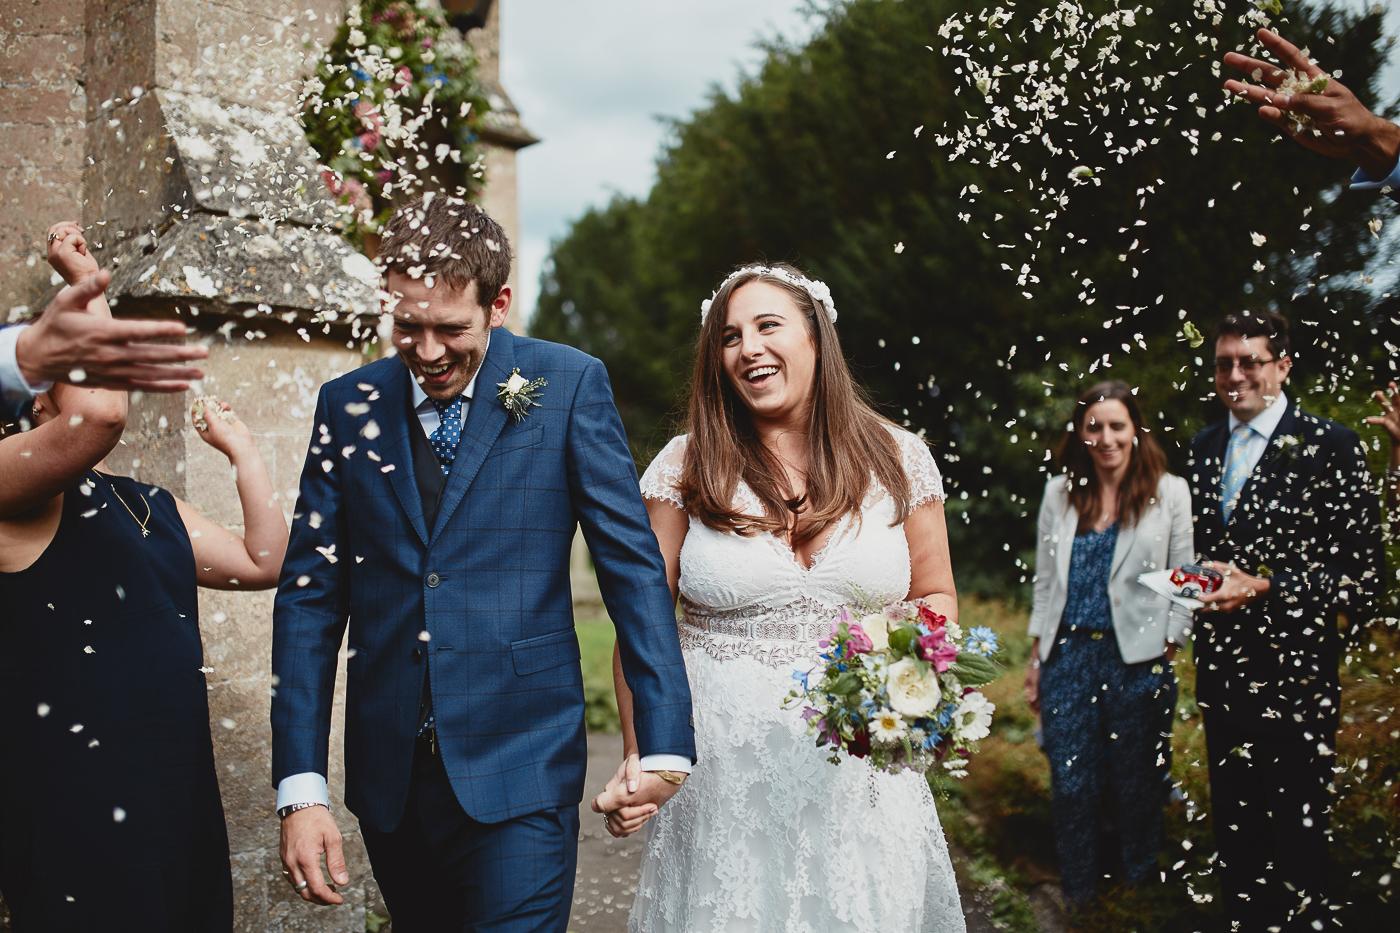 Danni_And_Jack_Gloucester_Wedding-76.jpg